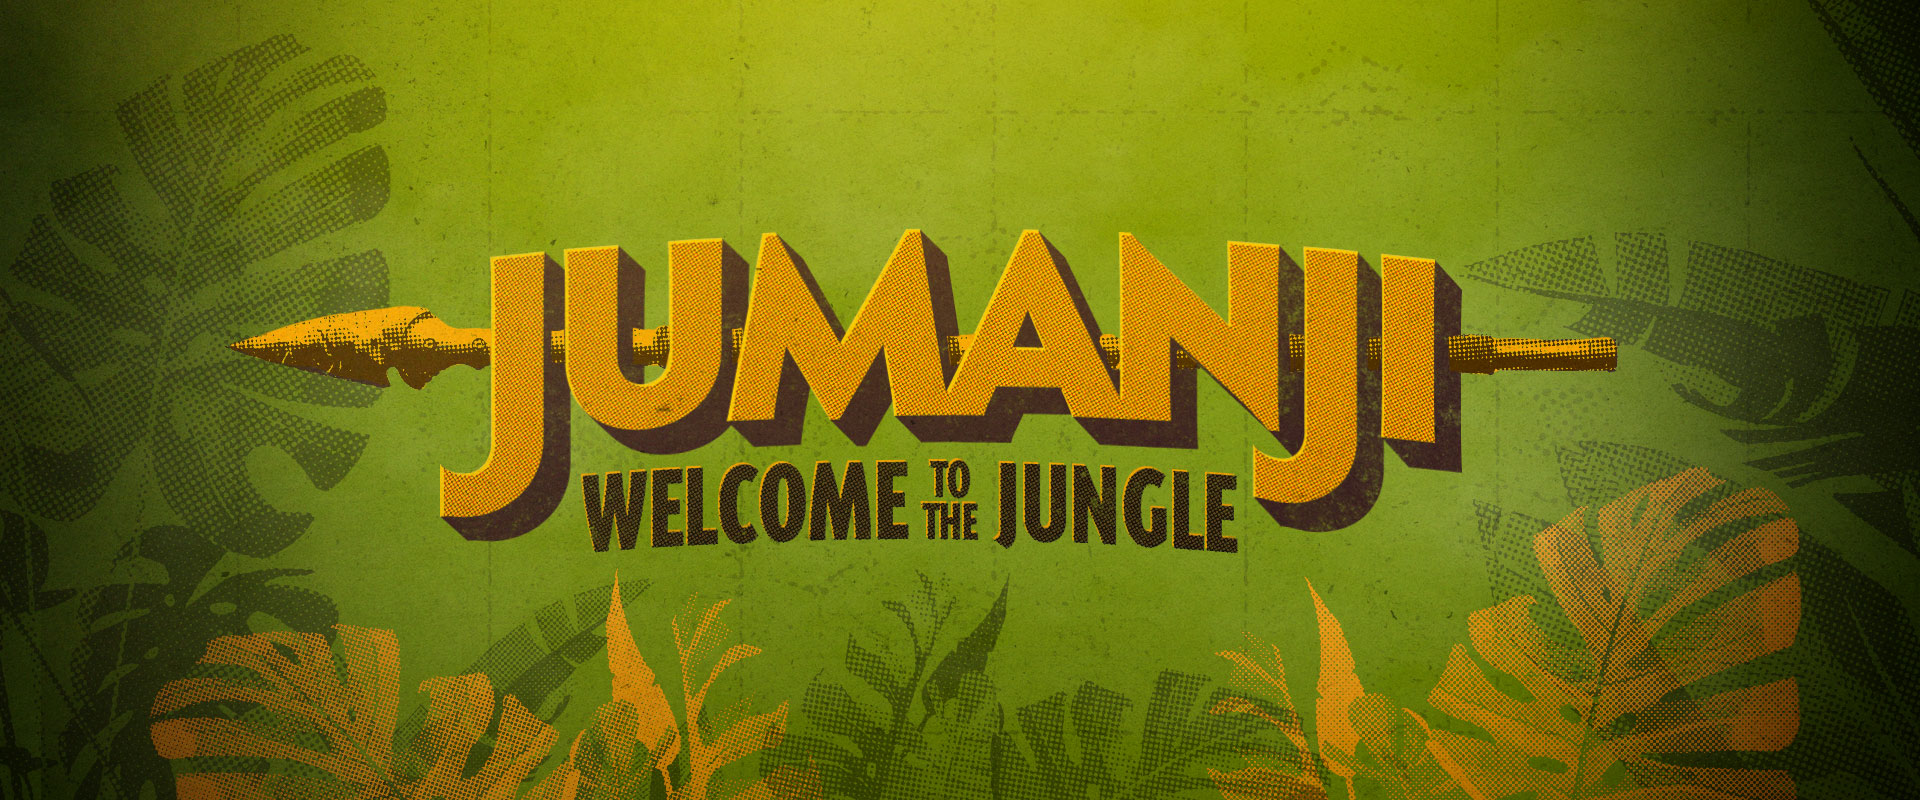 Jumanji: Welcome to the Jungle - Alphonse Swinehart